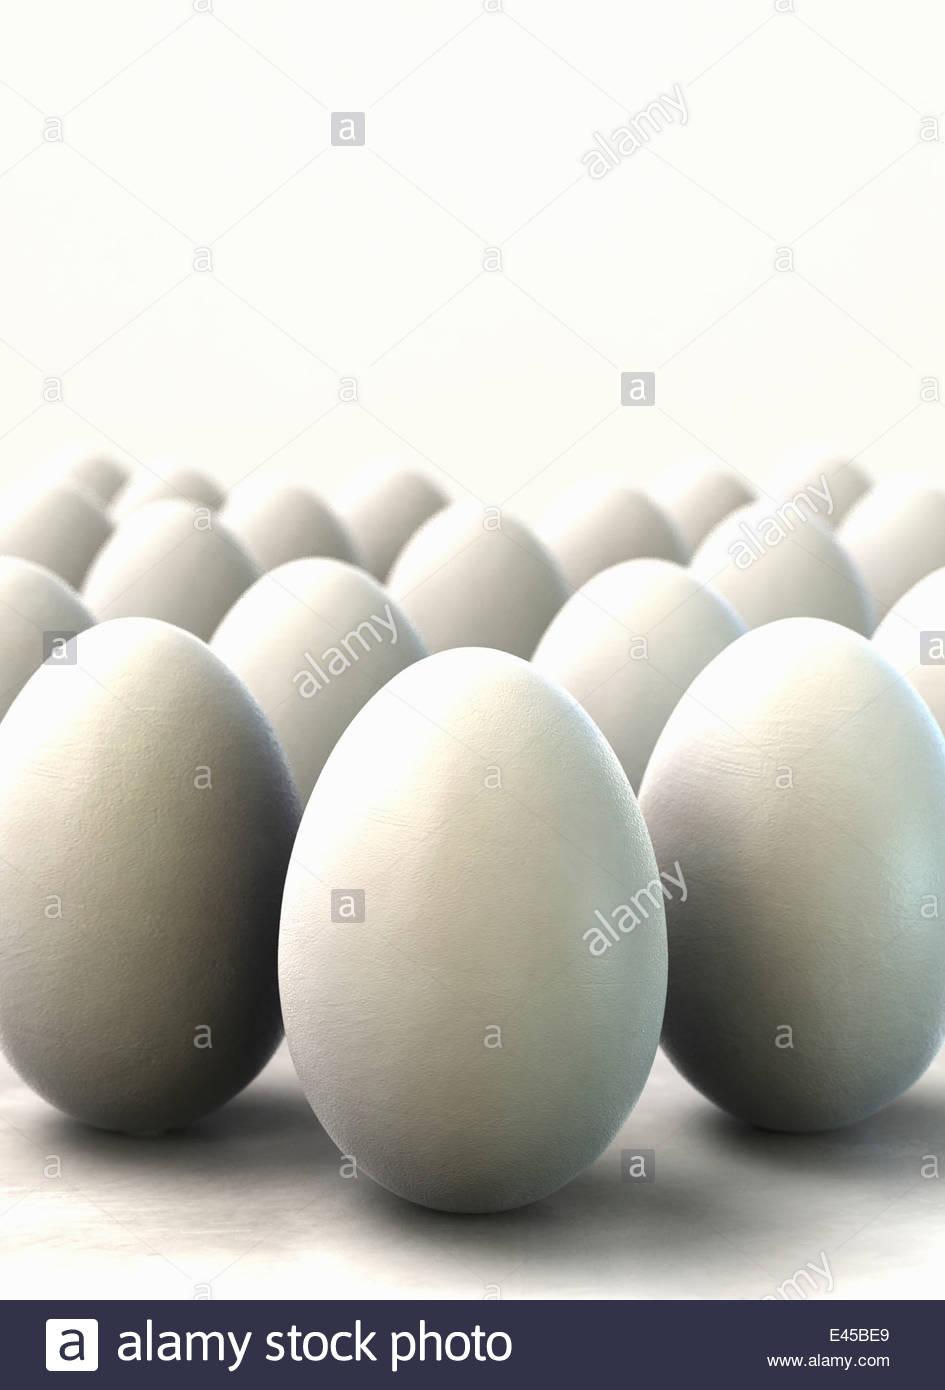 Rows of white eggs - Stock Image